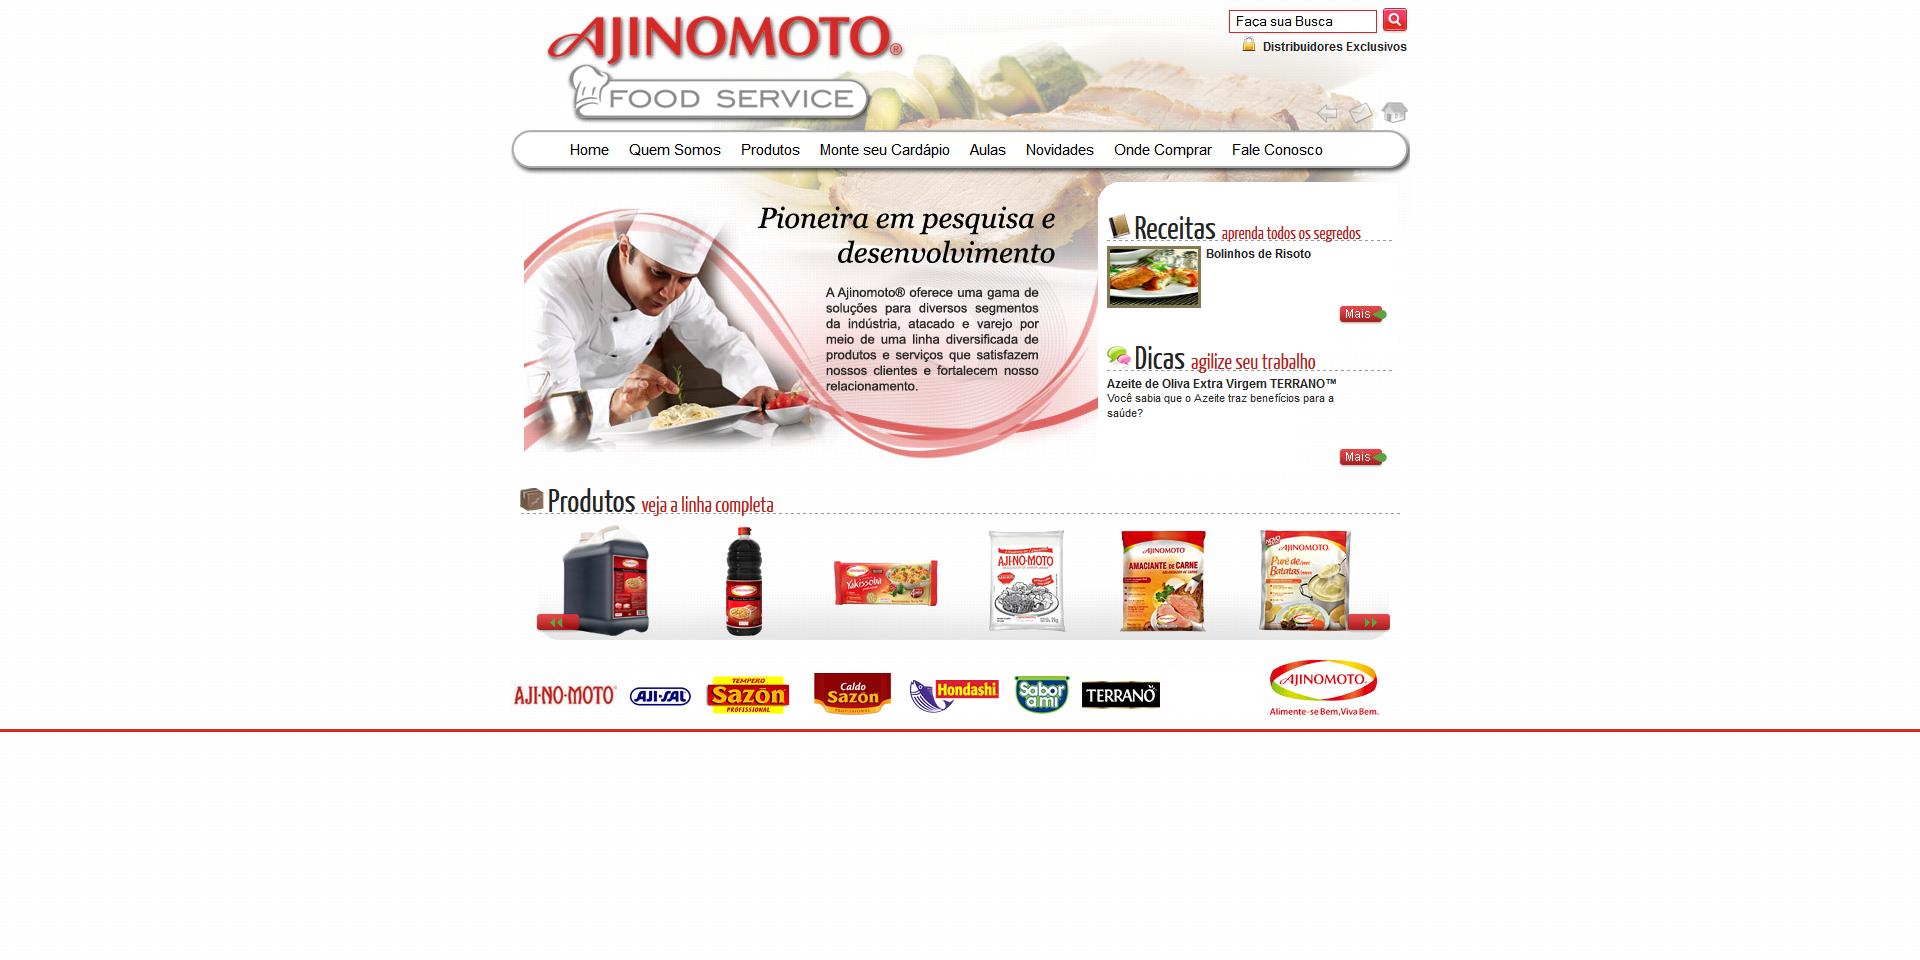 Imagem do projeto Ajinomoto Food Service